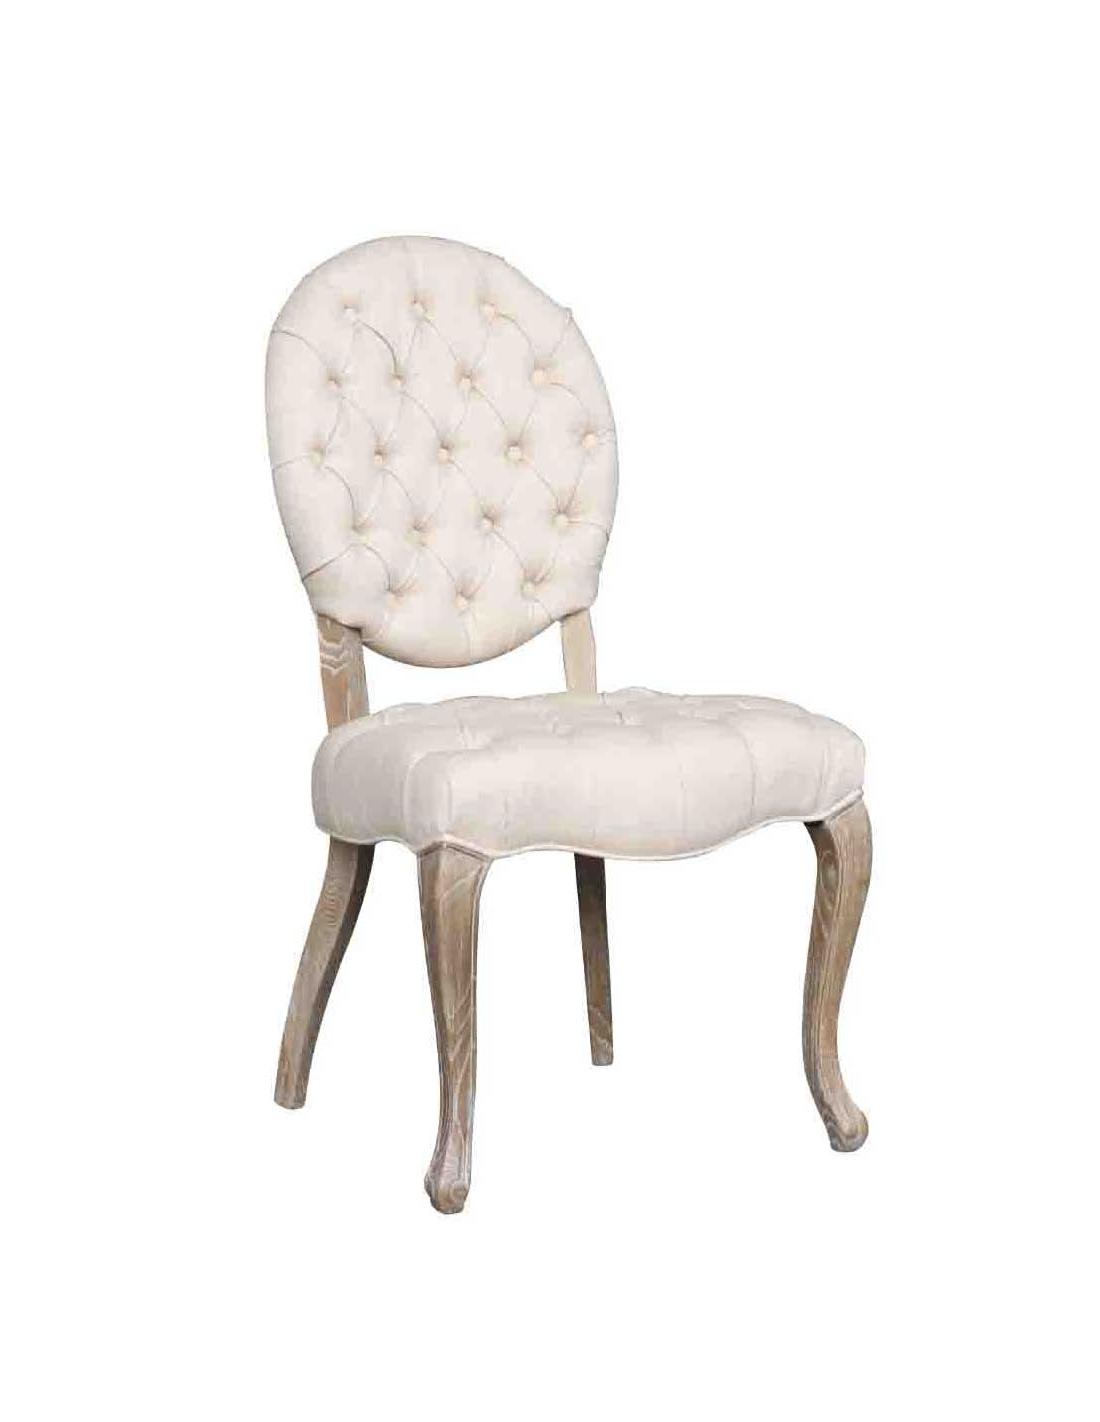 Comprar silla de comedor fabiola madera de roble 54 x 64 x for Sillas comedor roble